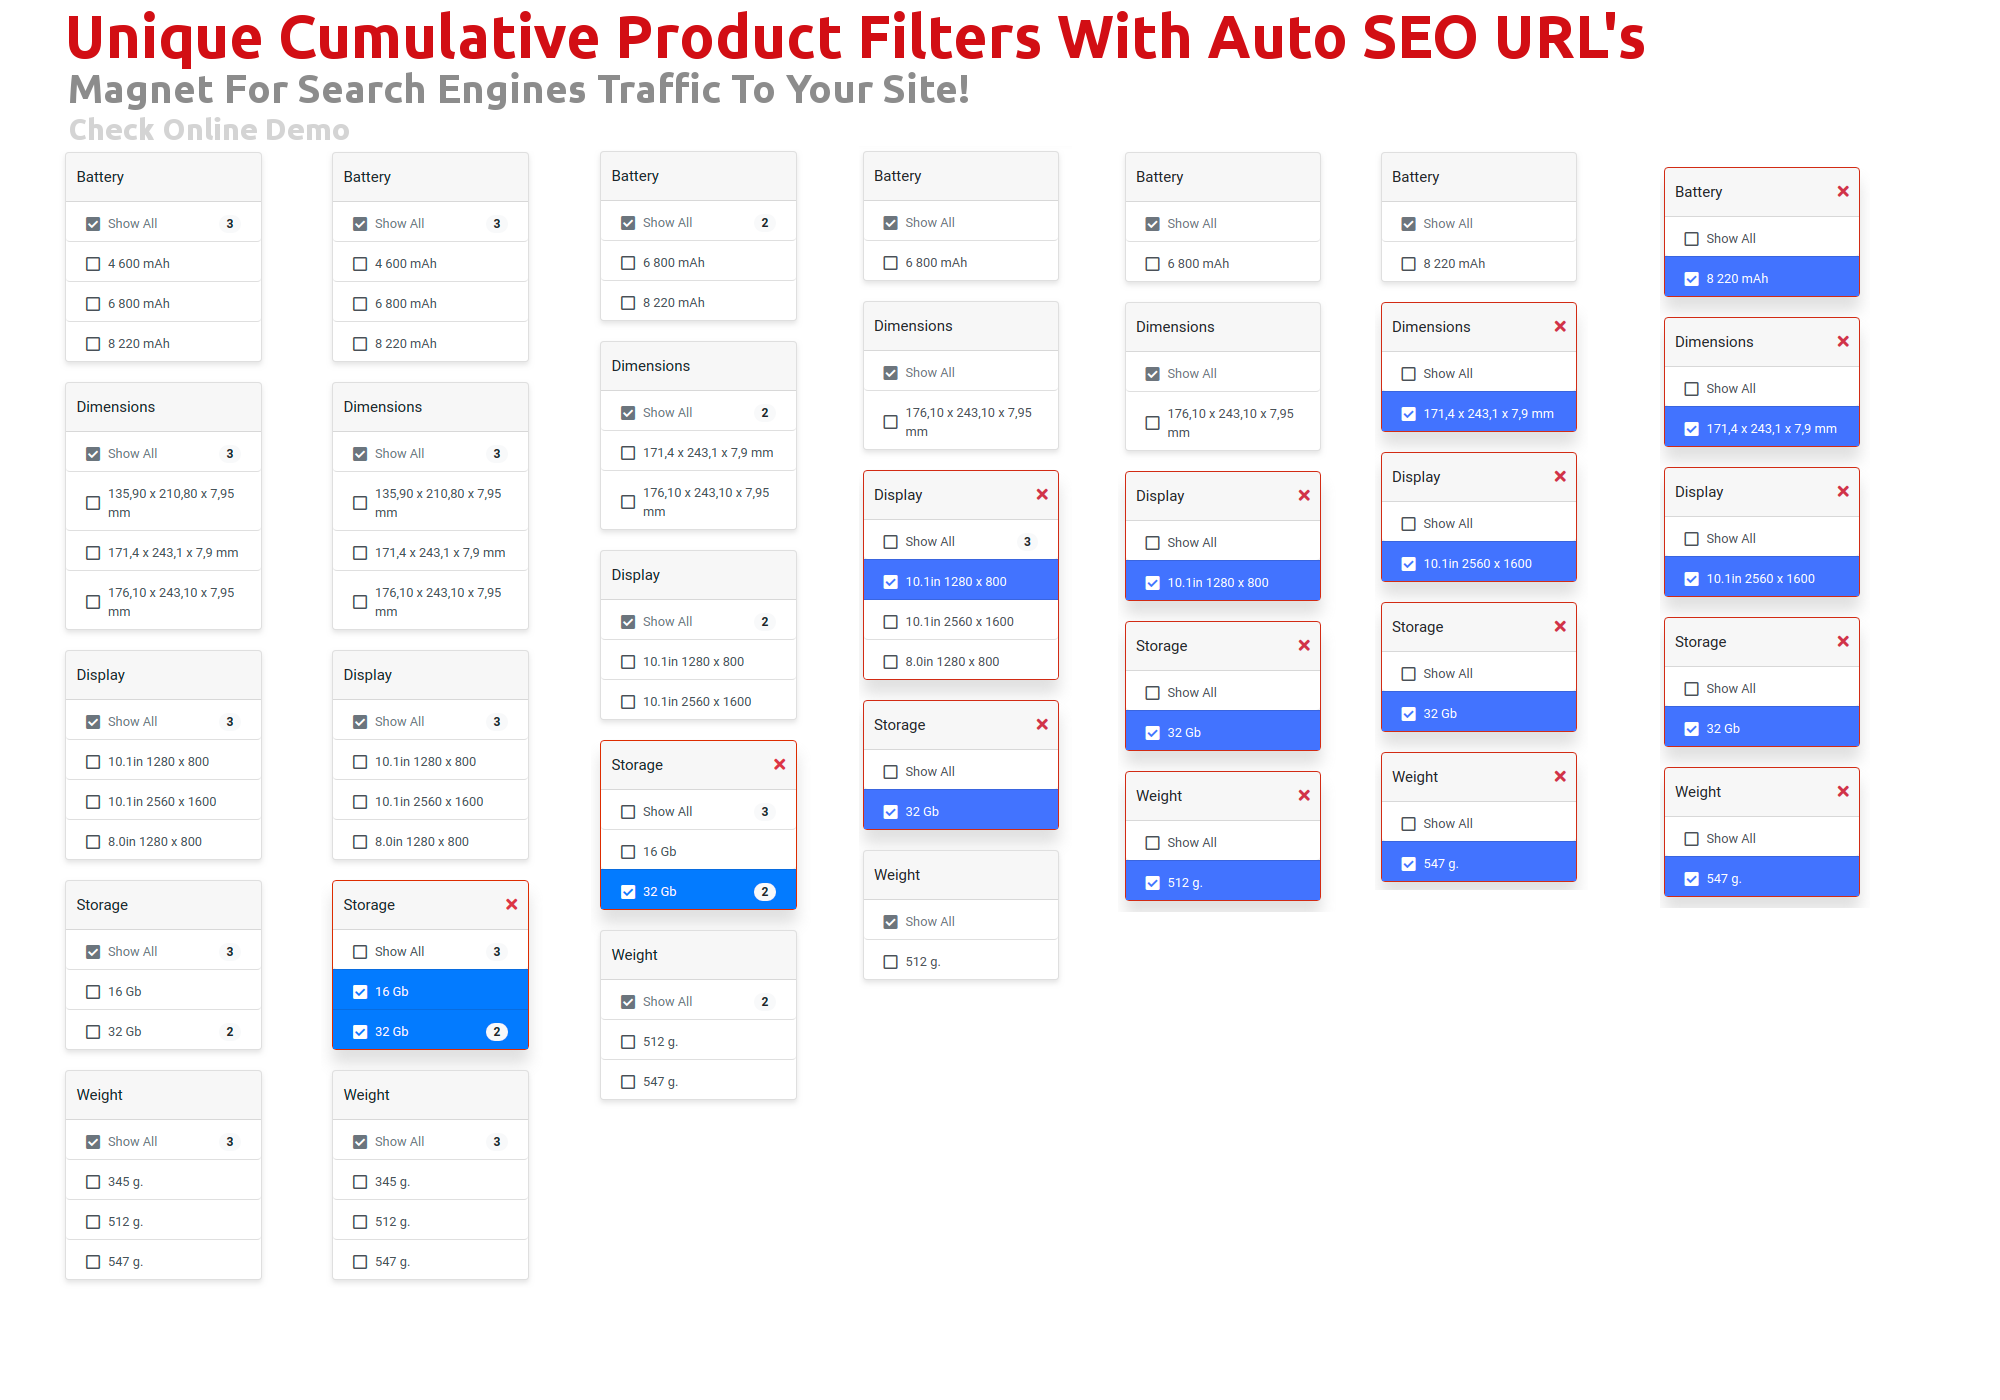 Unique Cumulative Product Filters With Auto SEO URL